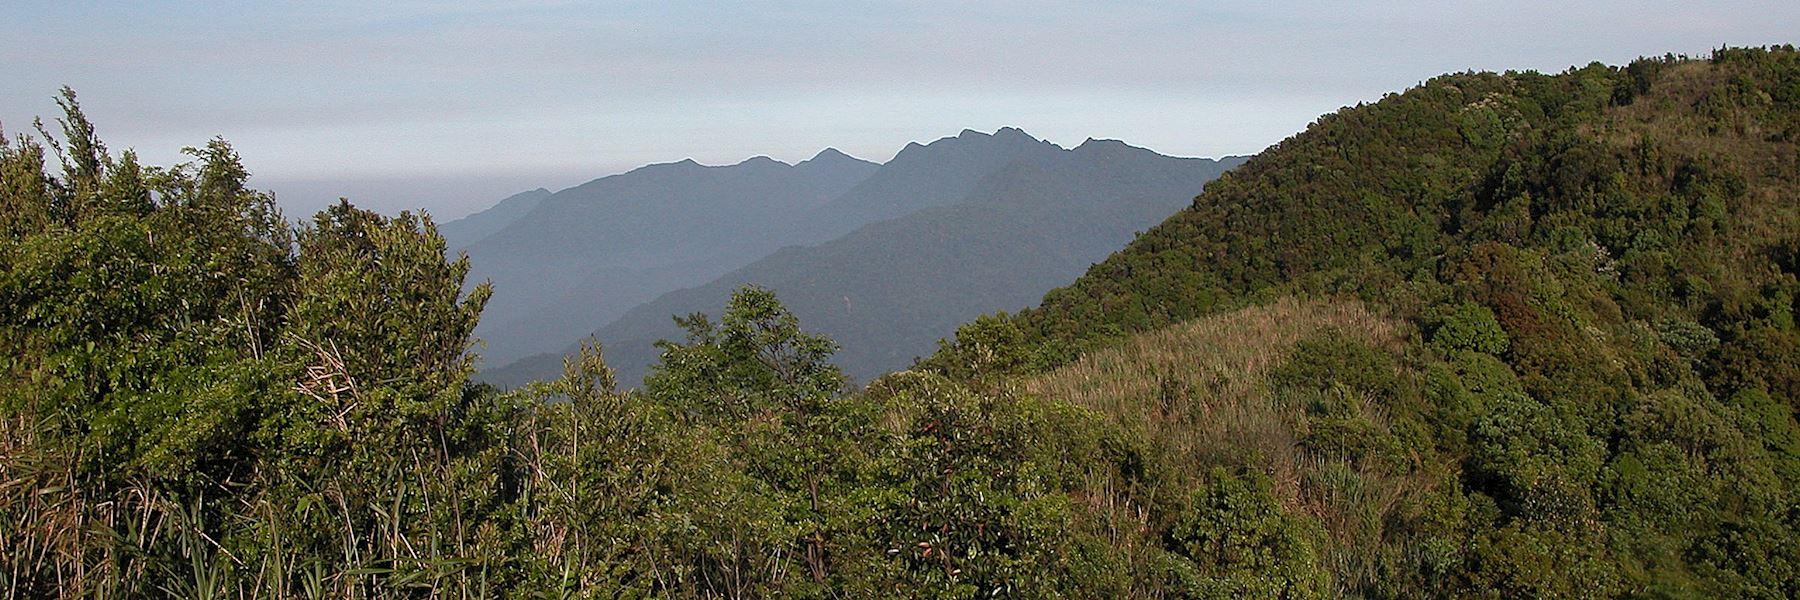 Visit Bach Ma National Park, Vietnam